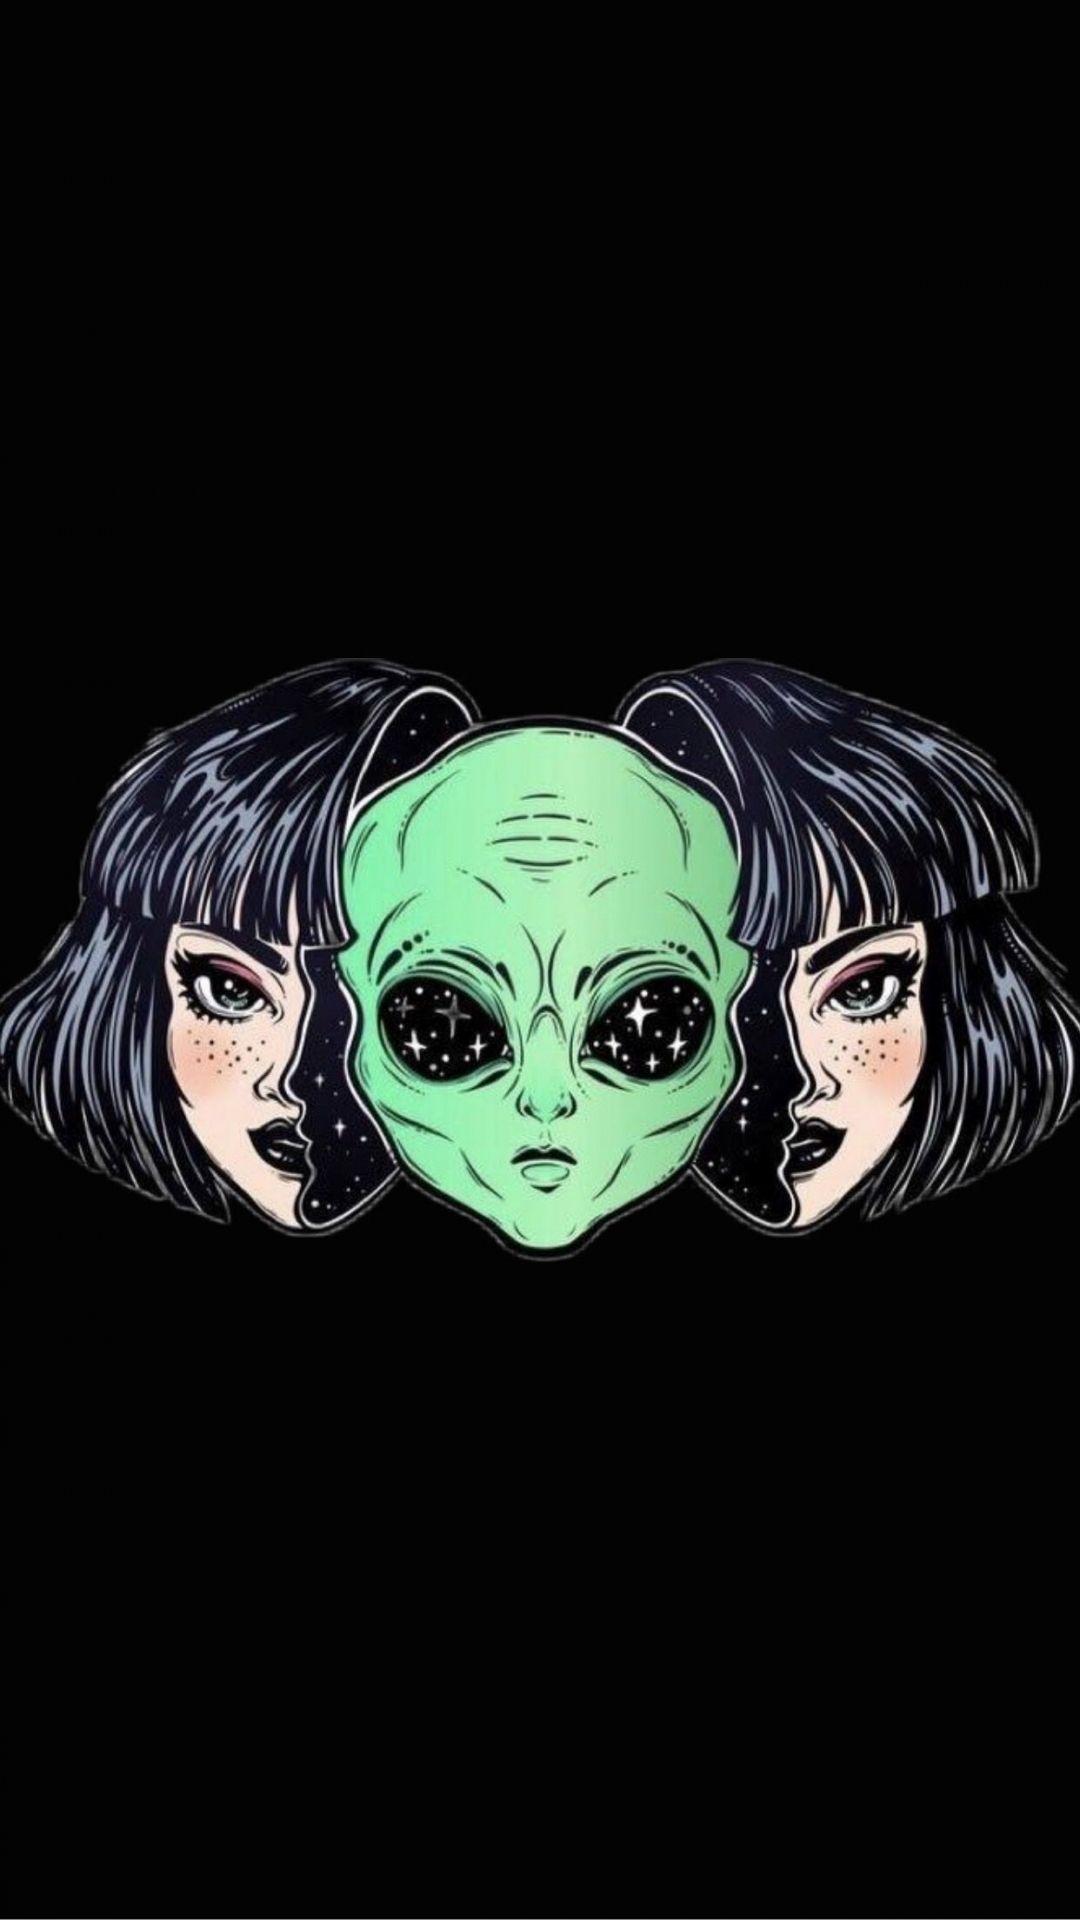 Aesthetic Cute Alien Wallpaper Android Download In 2020 Alien